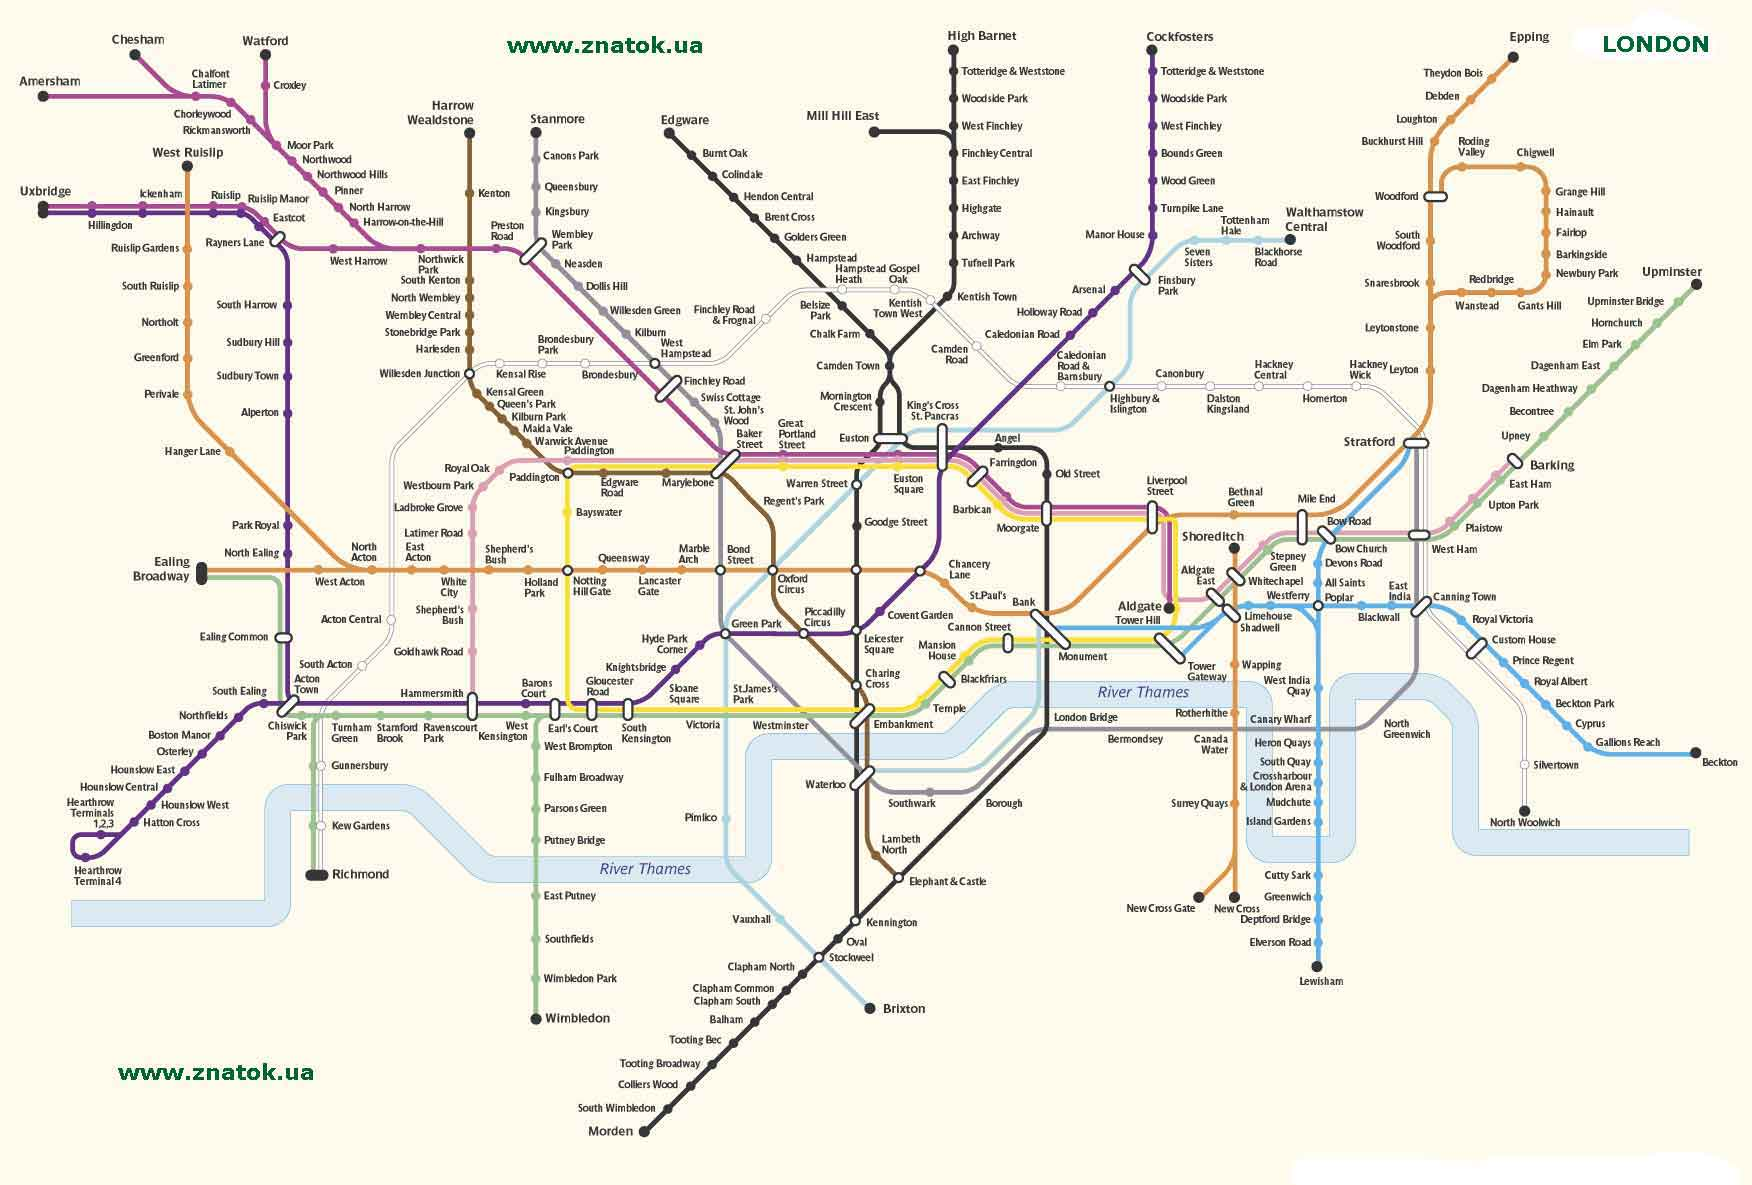 Альбом.  Схема линий метро Лондона.